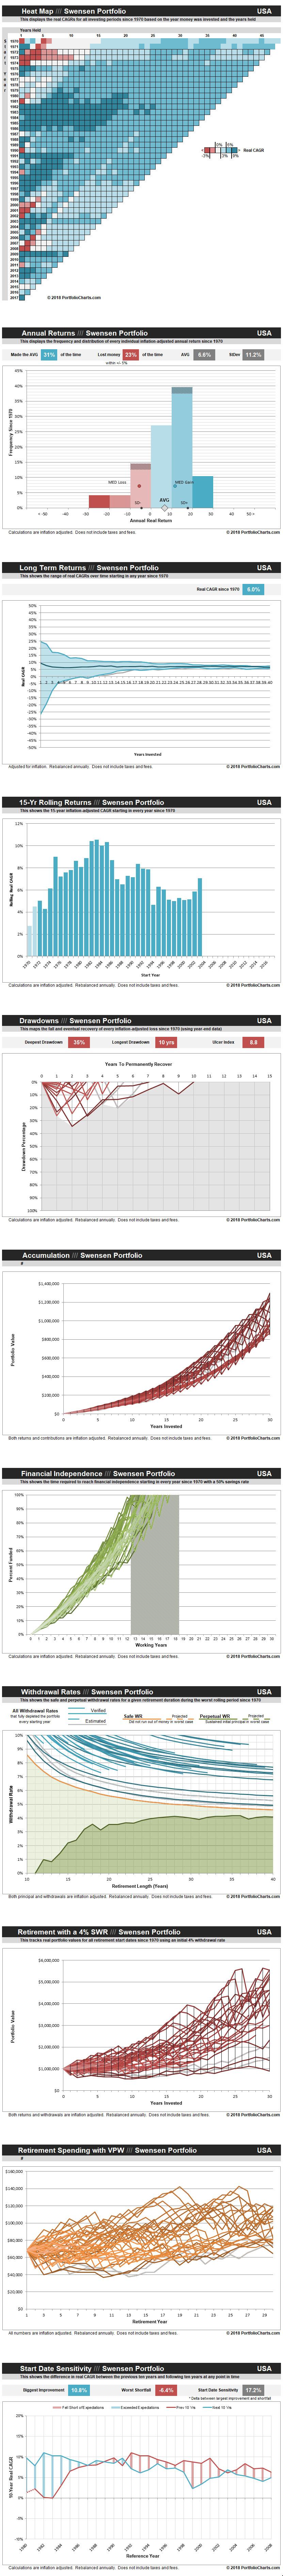 swensen-portfolio-USA-20180508